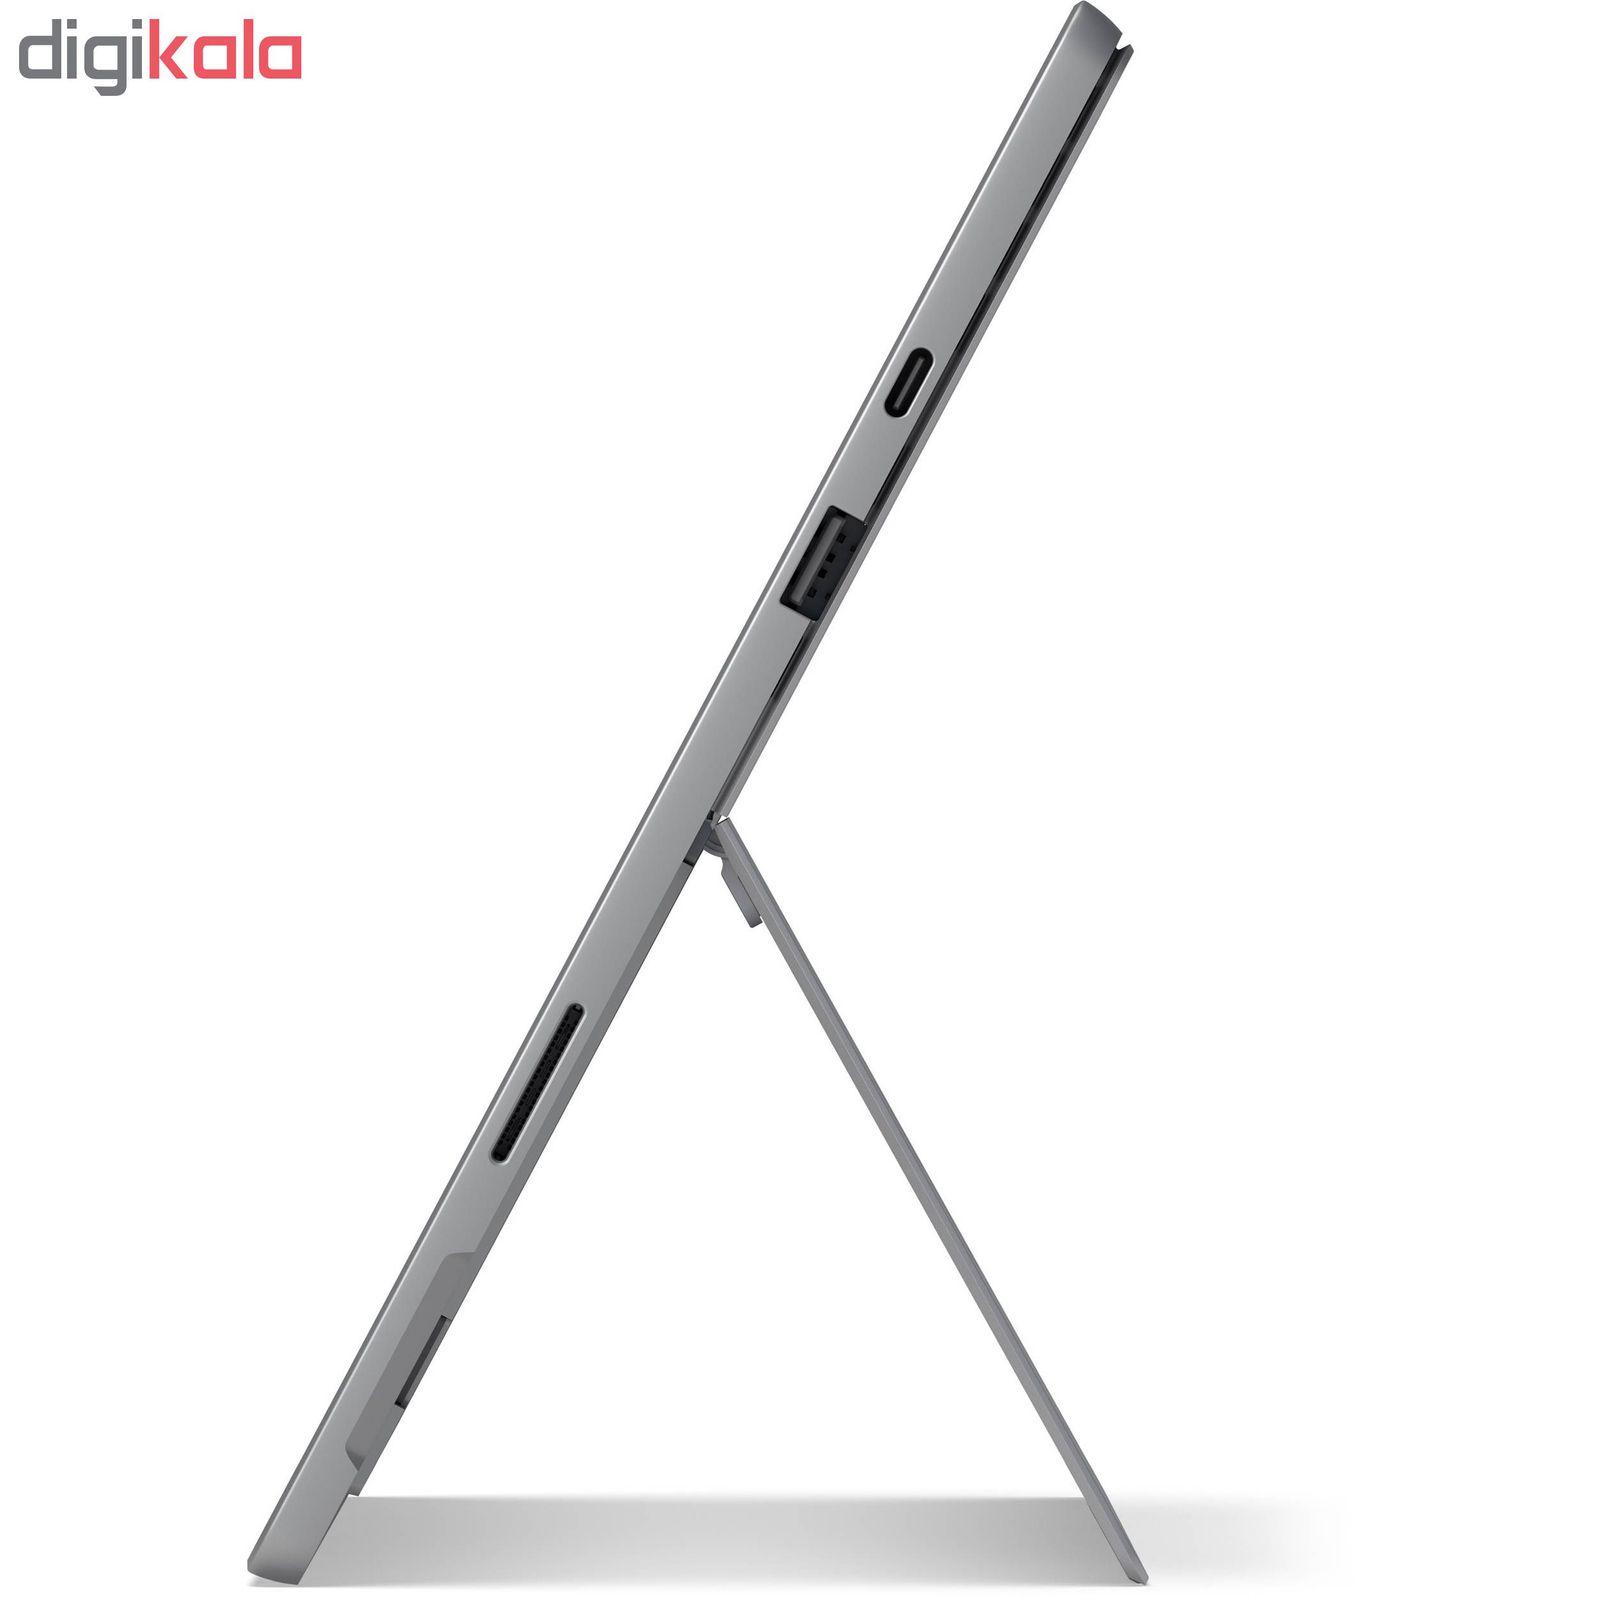 تبلت مایکروسافت مدل Surface Pro 7 - F به همراه کیبورد Black Type Cover main 1 8